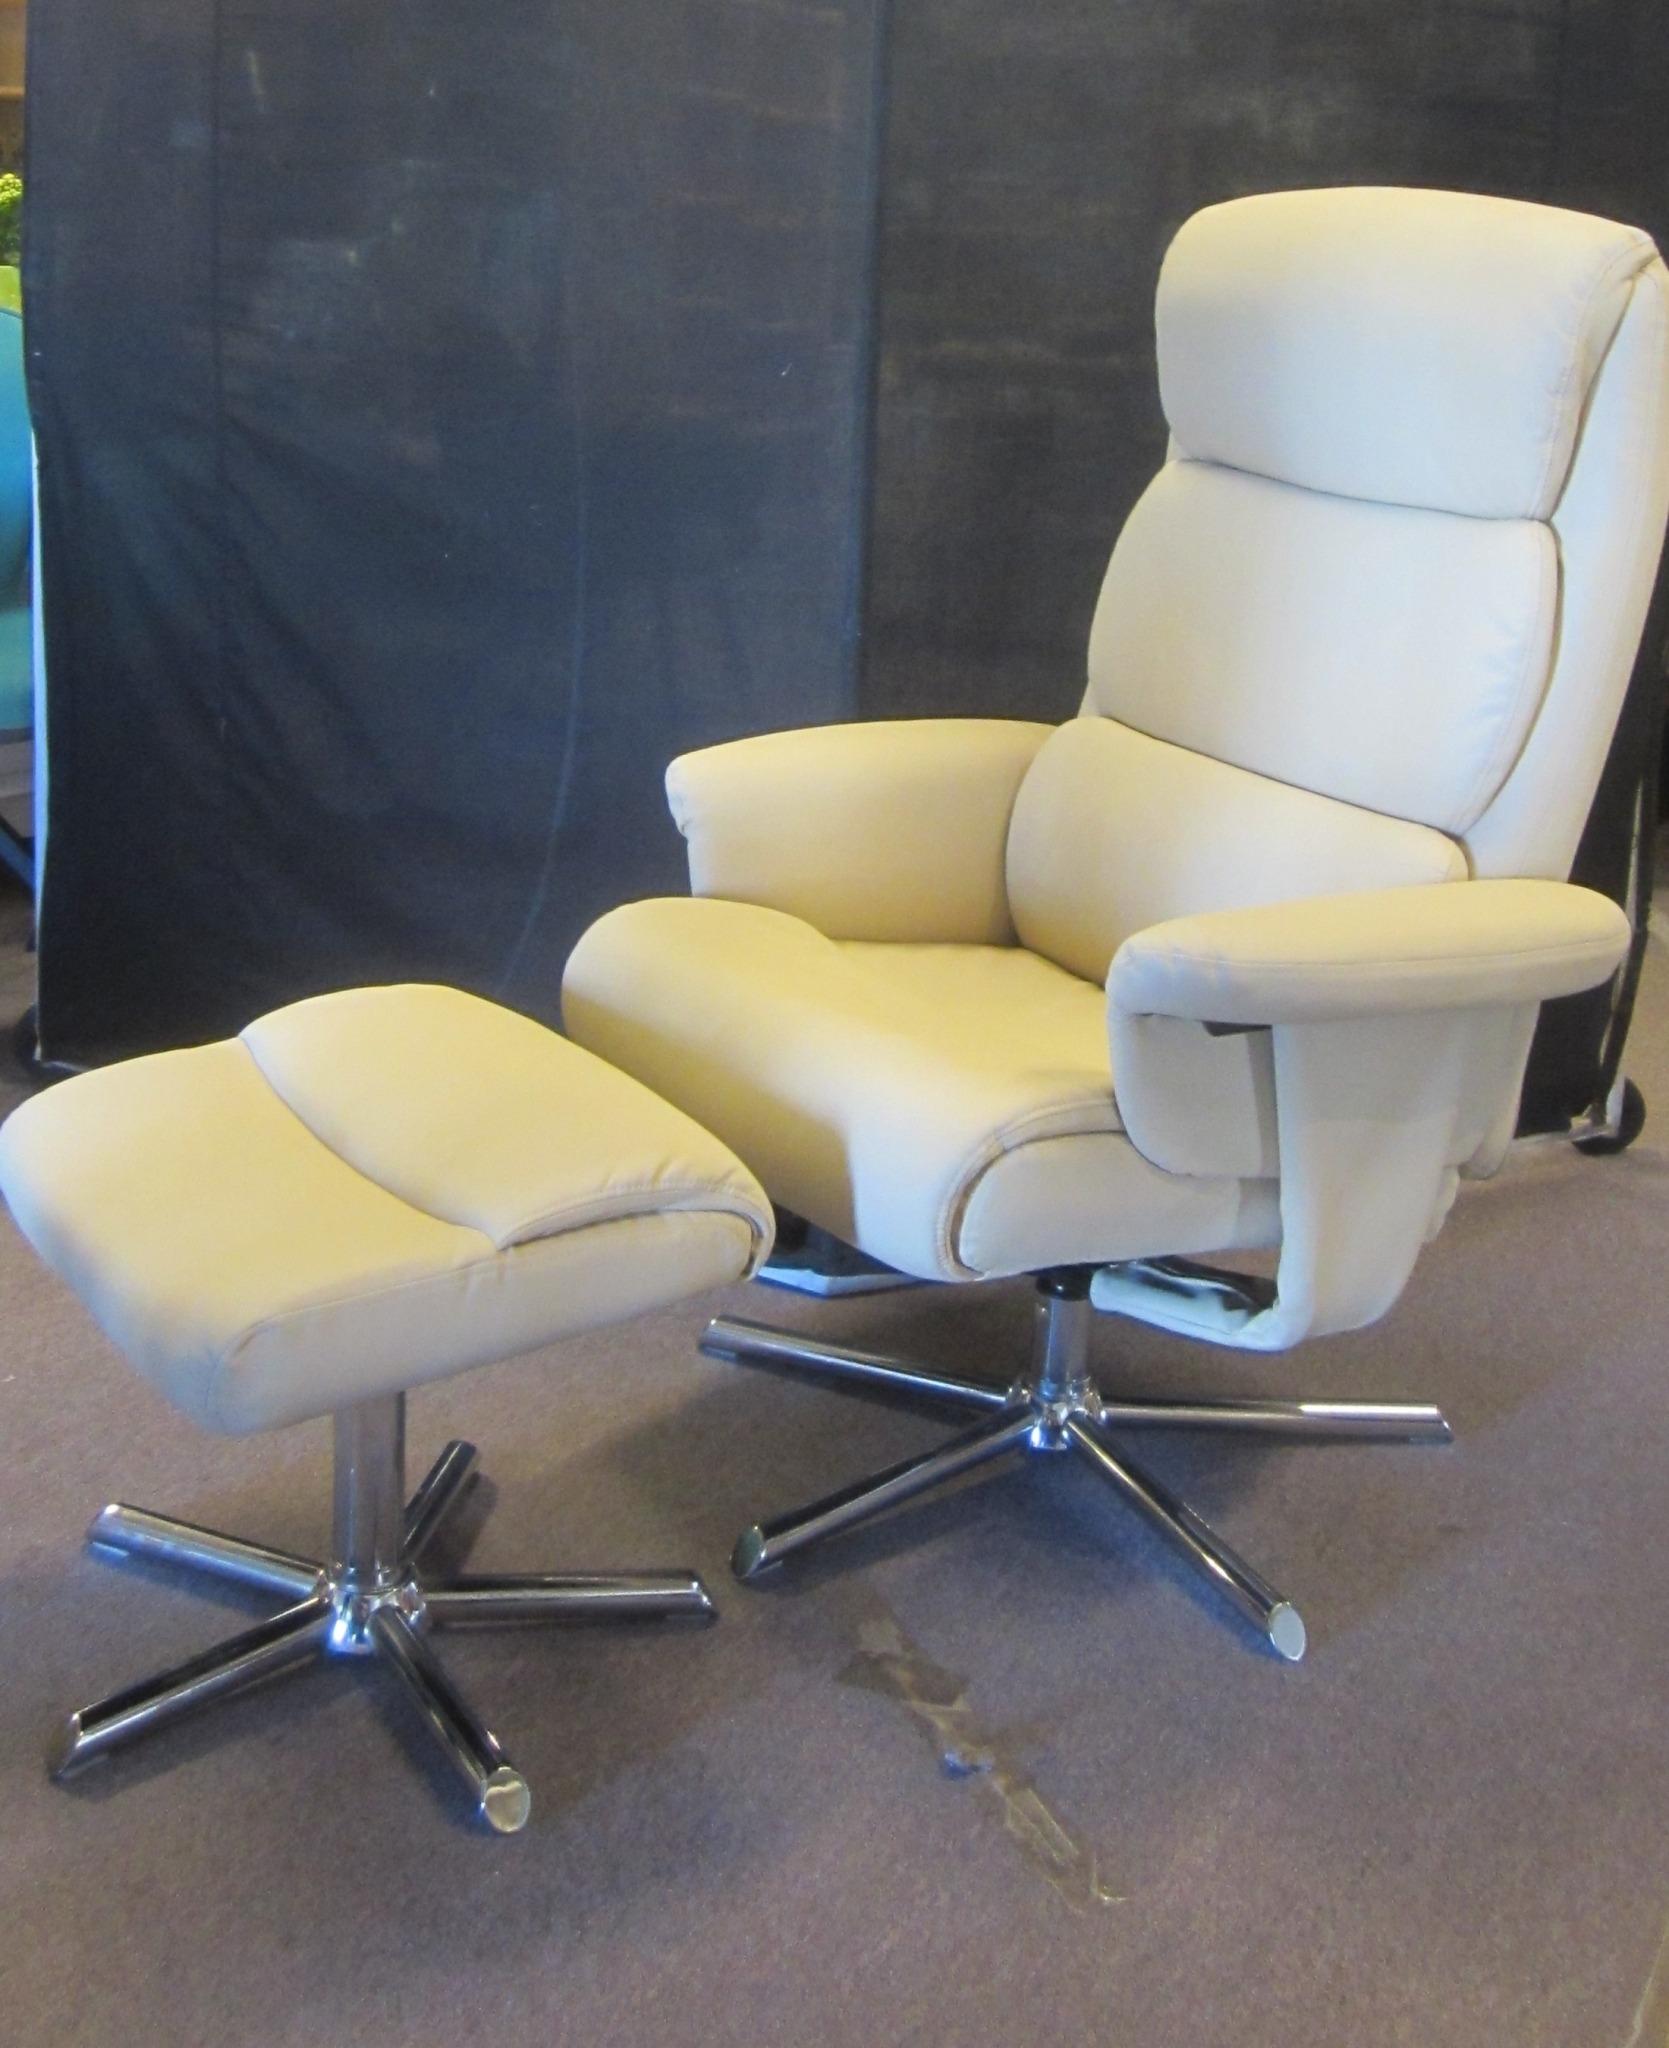 Læderstol med skammel